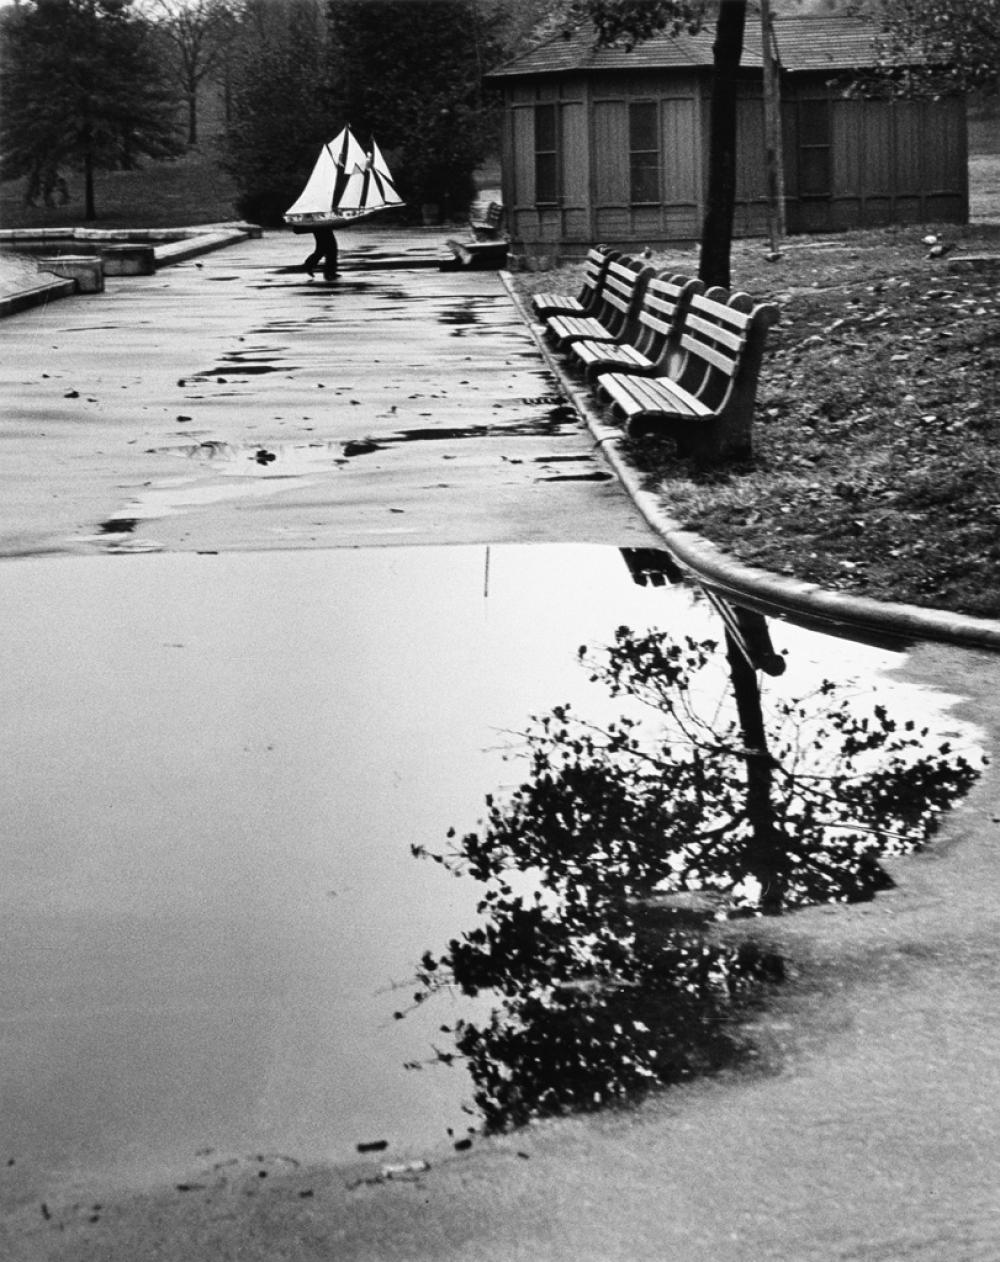 ANDRÉ KERTÉSZ (1894-1995) Homing Ship, Central Park, New York.